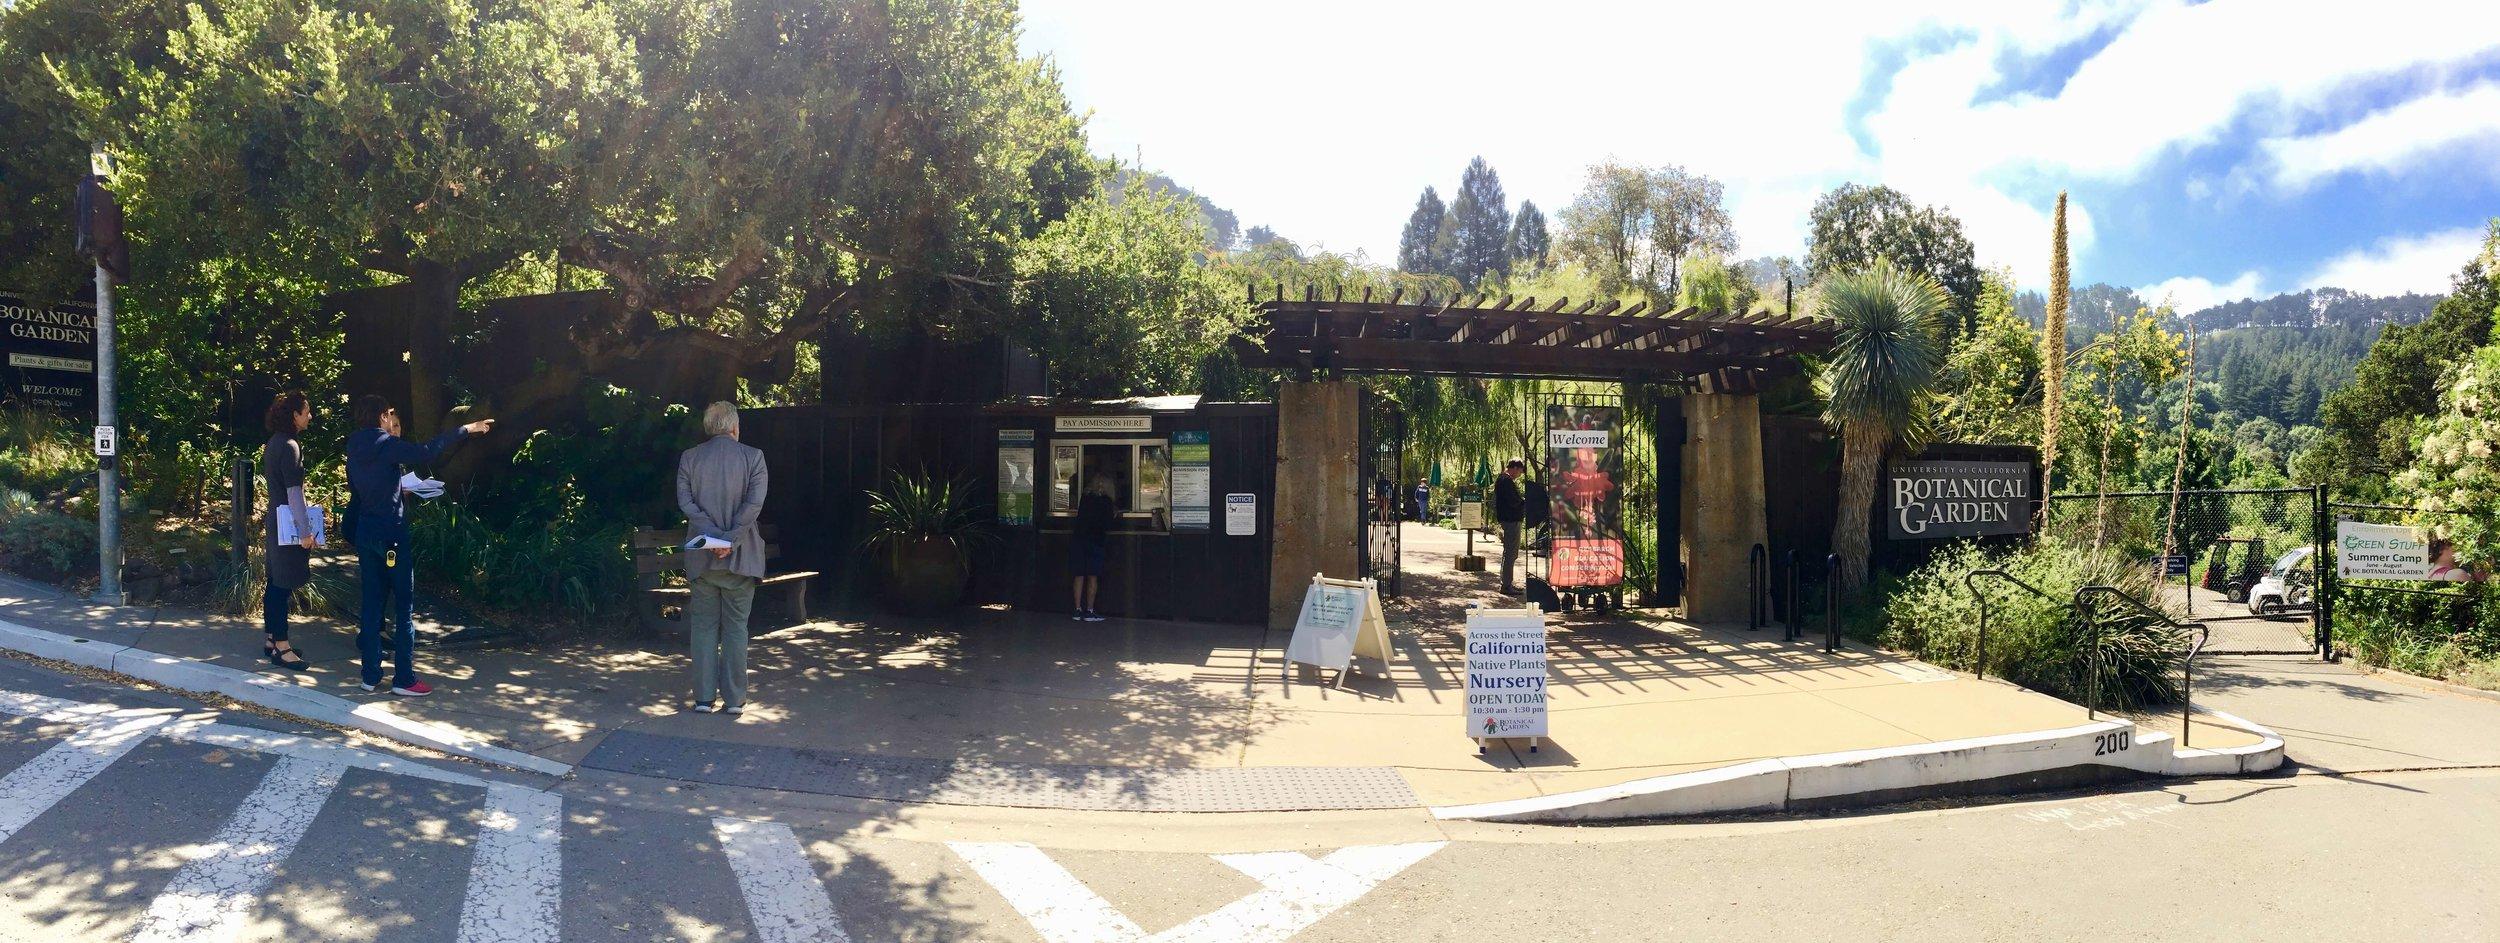 1-University of California Botanical Garden at UC Berkeley-The Sibbett Group-Greenhouse-Entry Gate.jpg